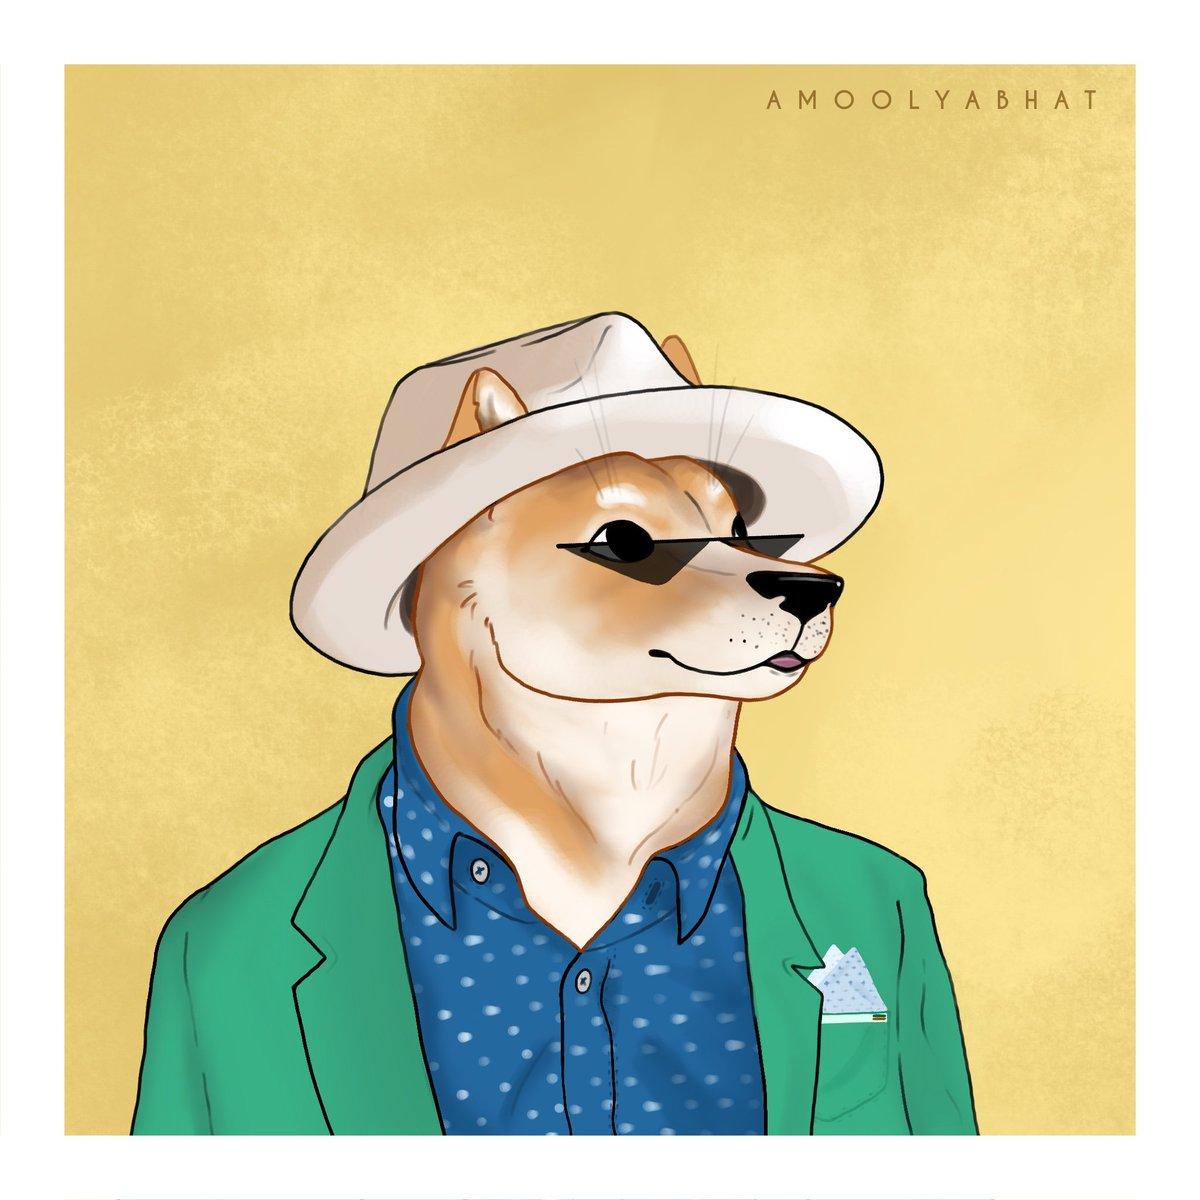 #doggust 01 - Suave Doge   #dogecoin #Dogecoinarmy #DogecoinToTheMoon #DogsofTwittter #DogeFam #doge #ArtistOnTwitter #shiba #shibainu #ShibaArmy #illustration #artchallenge #artist #nftforcharity #nftart #NFTsForGood #NFTshill #NFTcollectibles